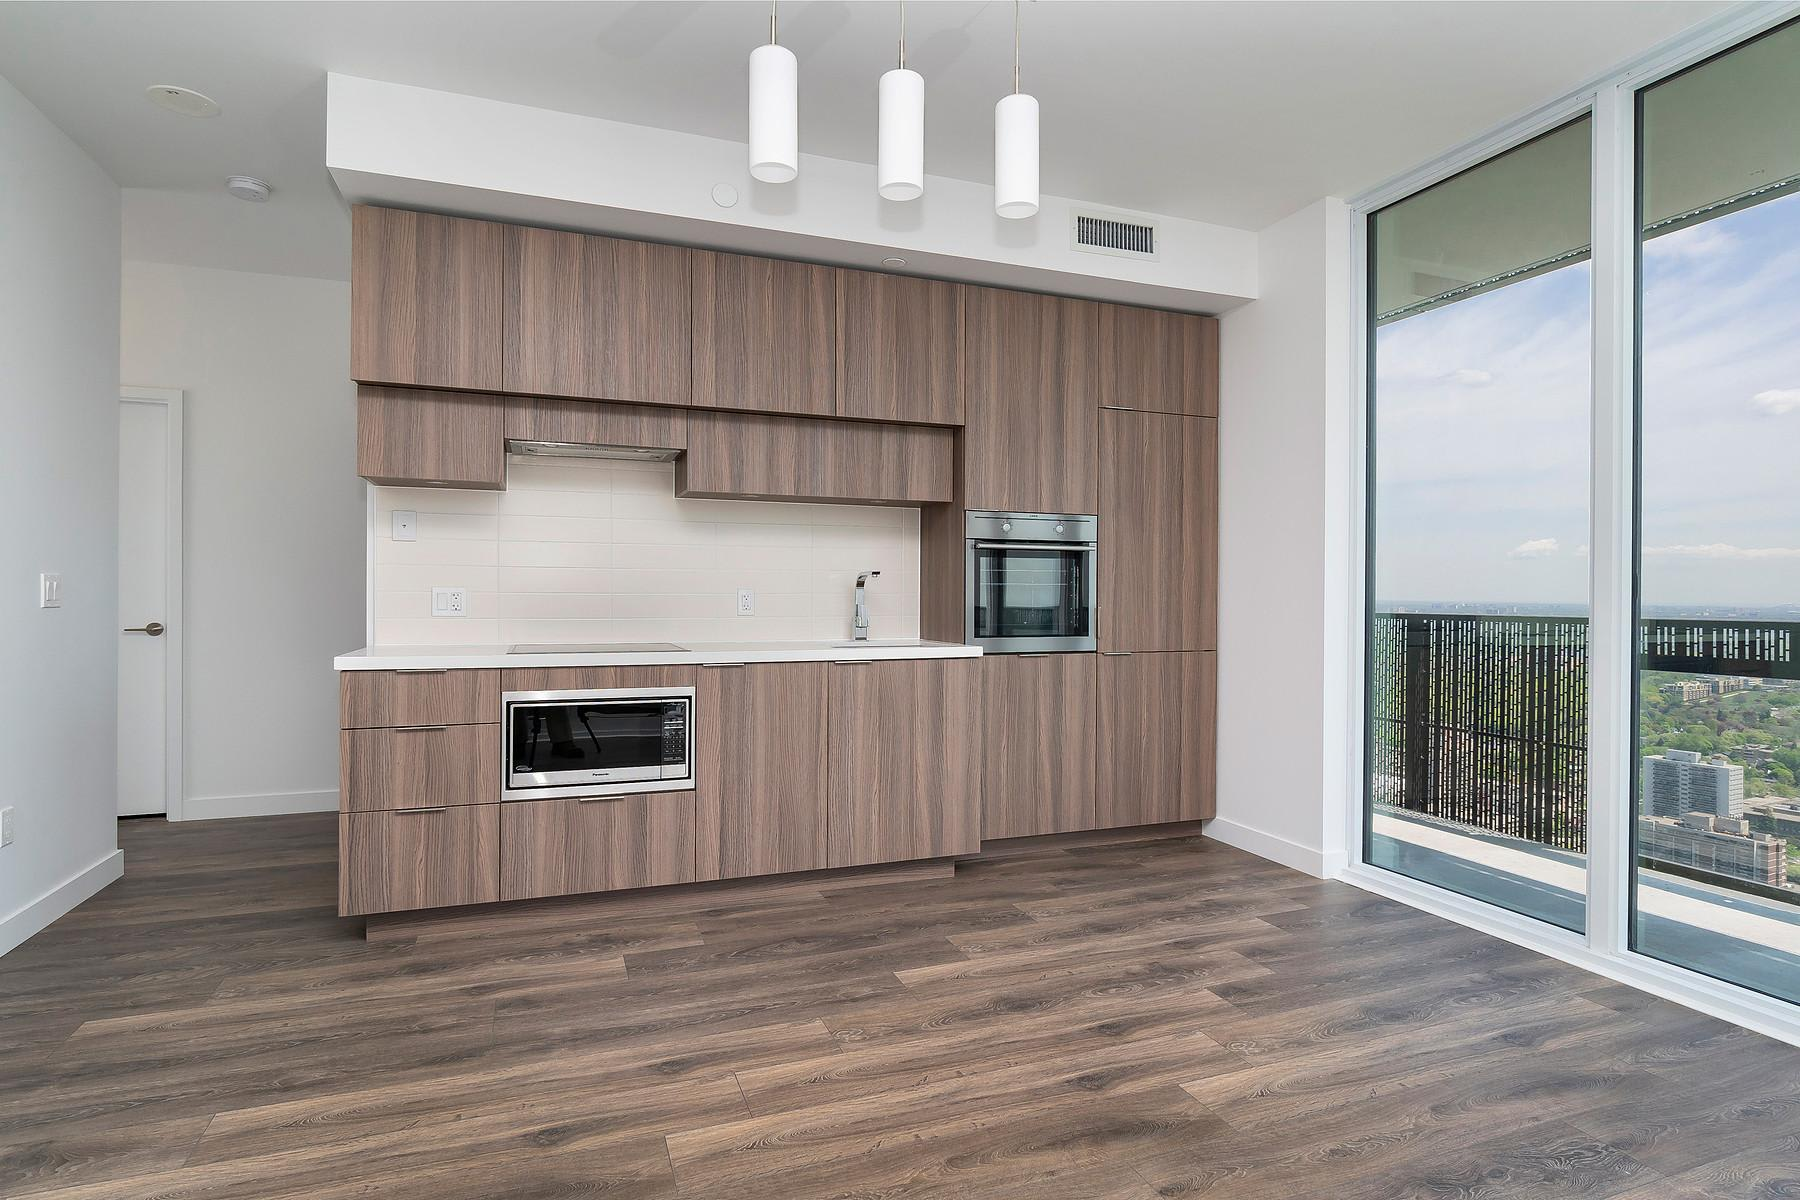 8 Eglinton Ave E Suite 4211